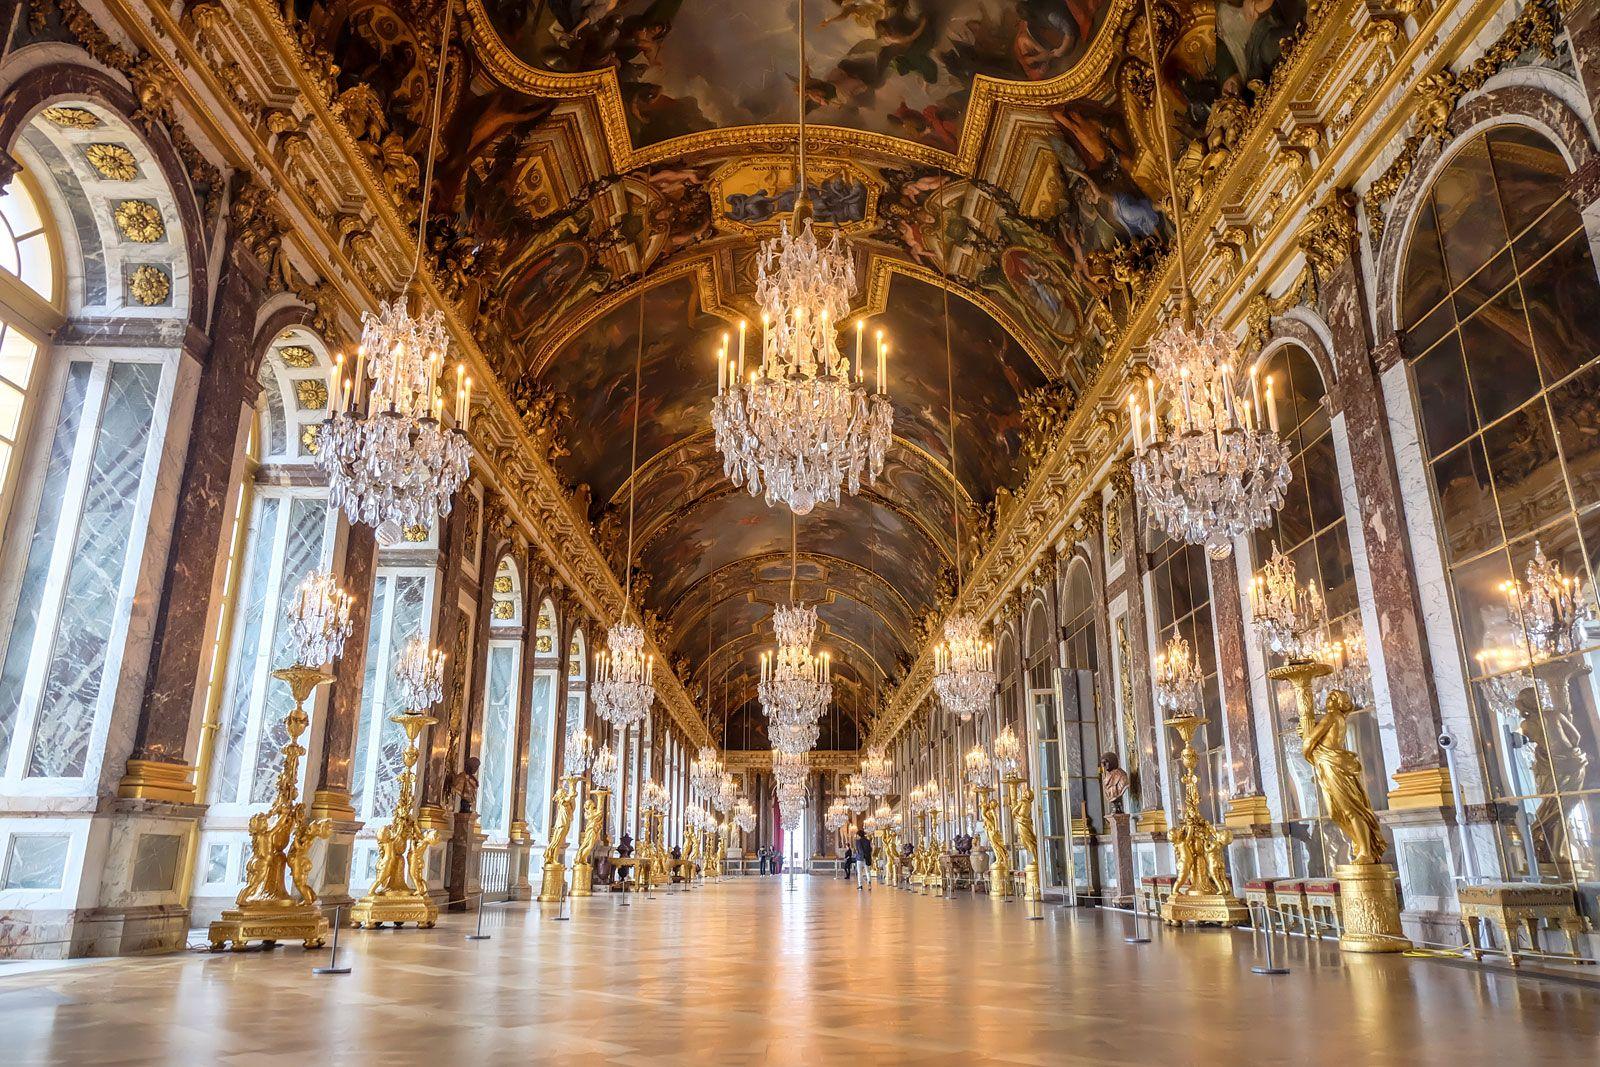 37af0febe69a5f4c0c6e8190feea8f41 - Palace Of Versailles Gardens Outdoor Ballroom